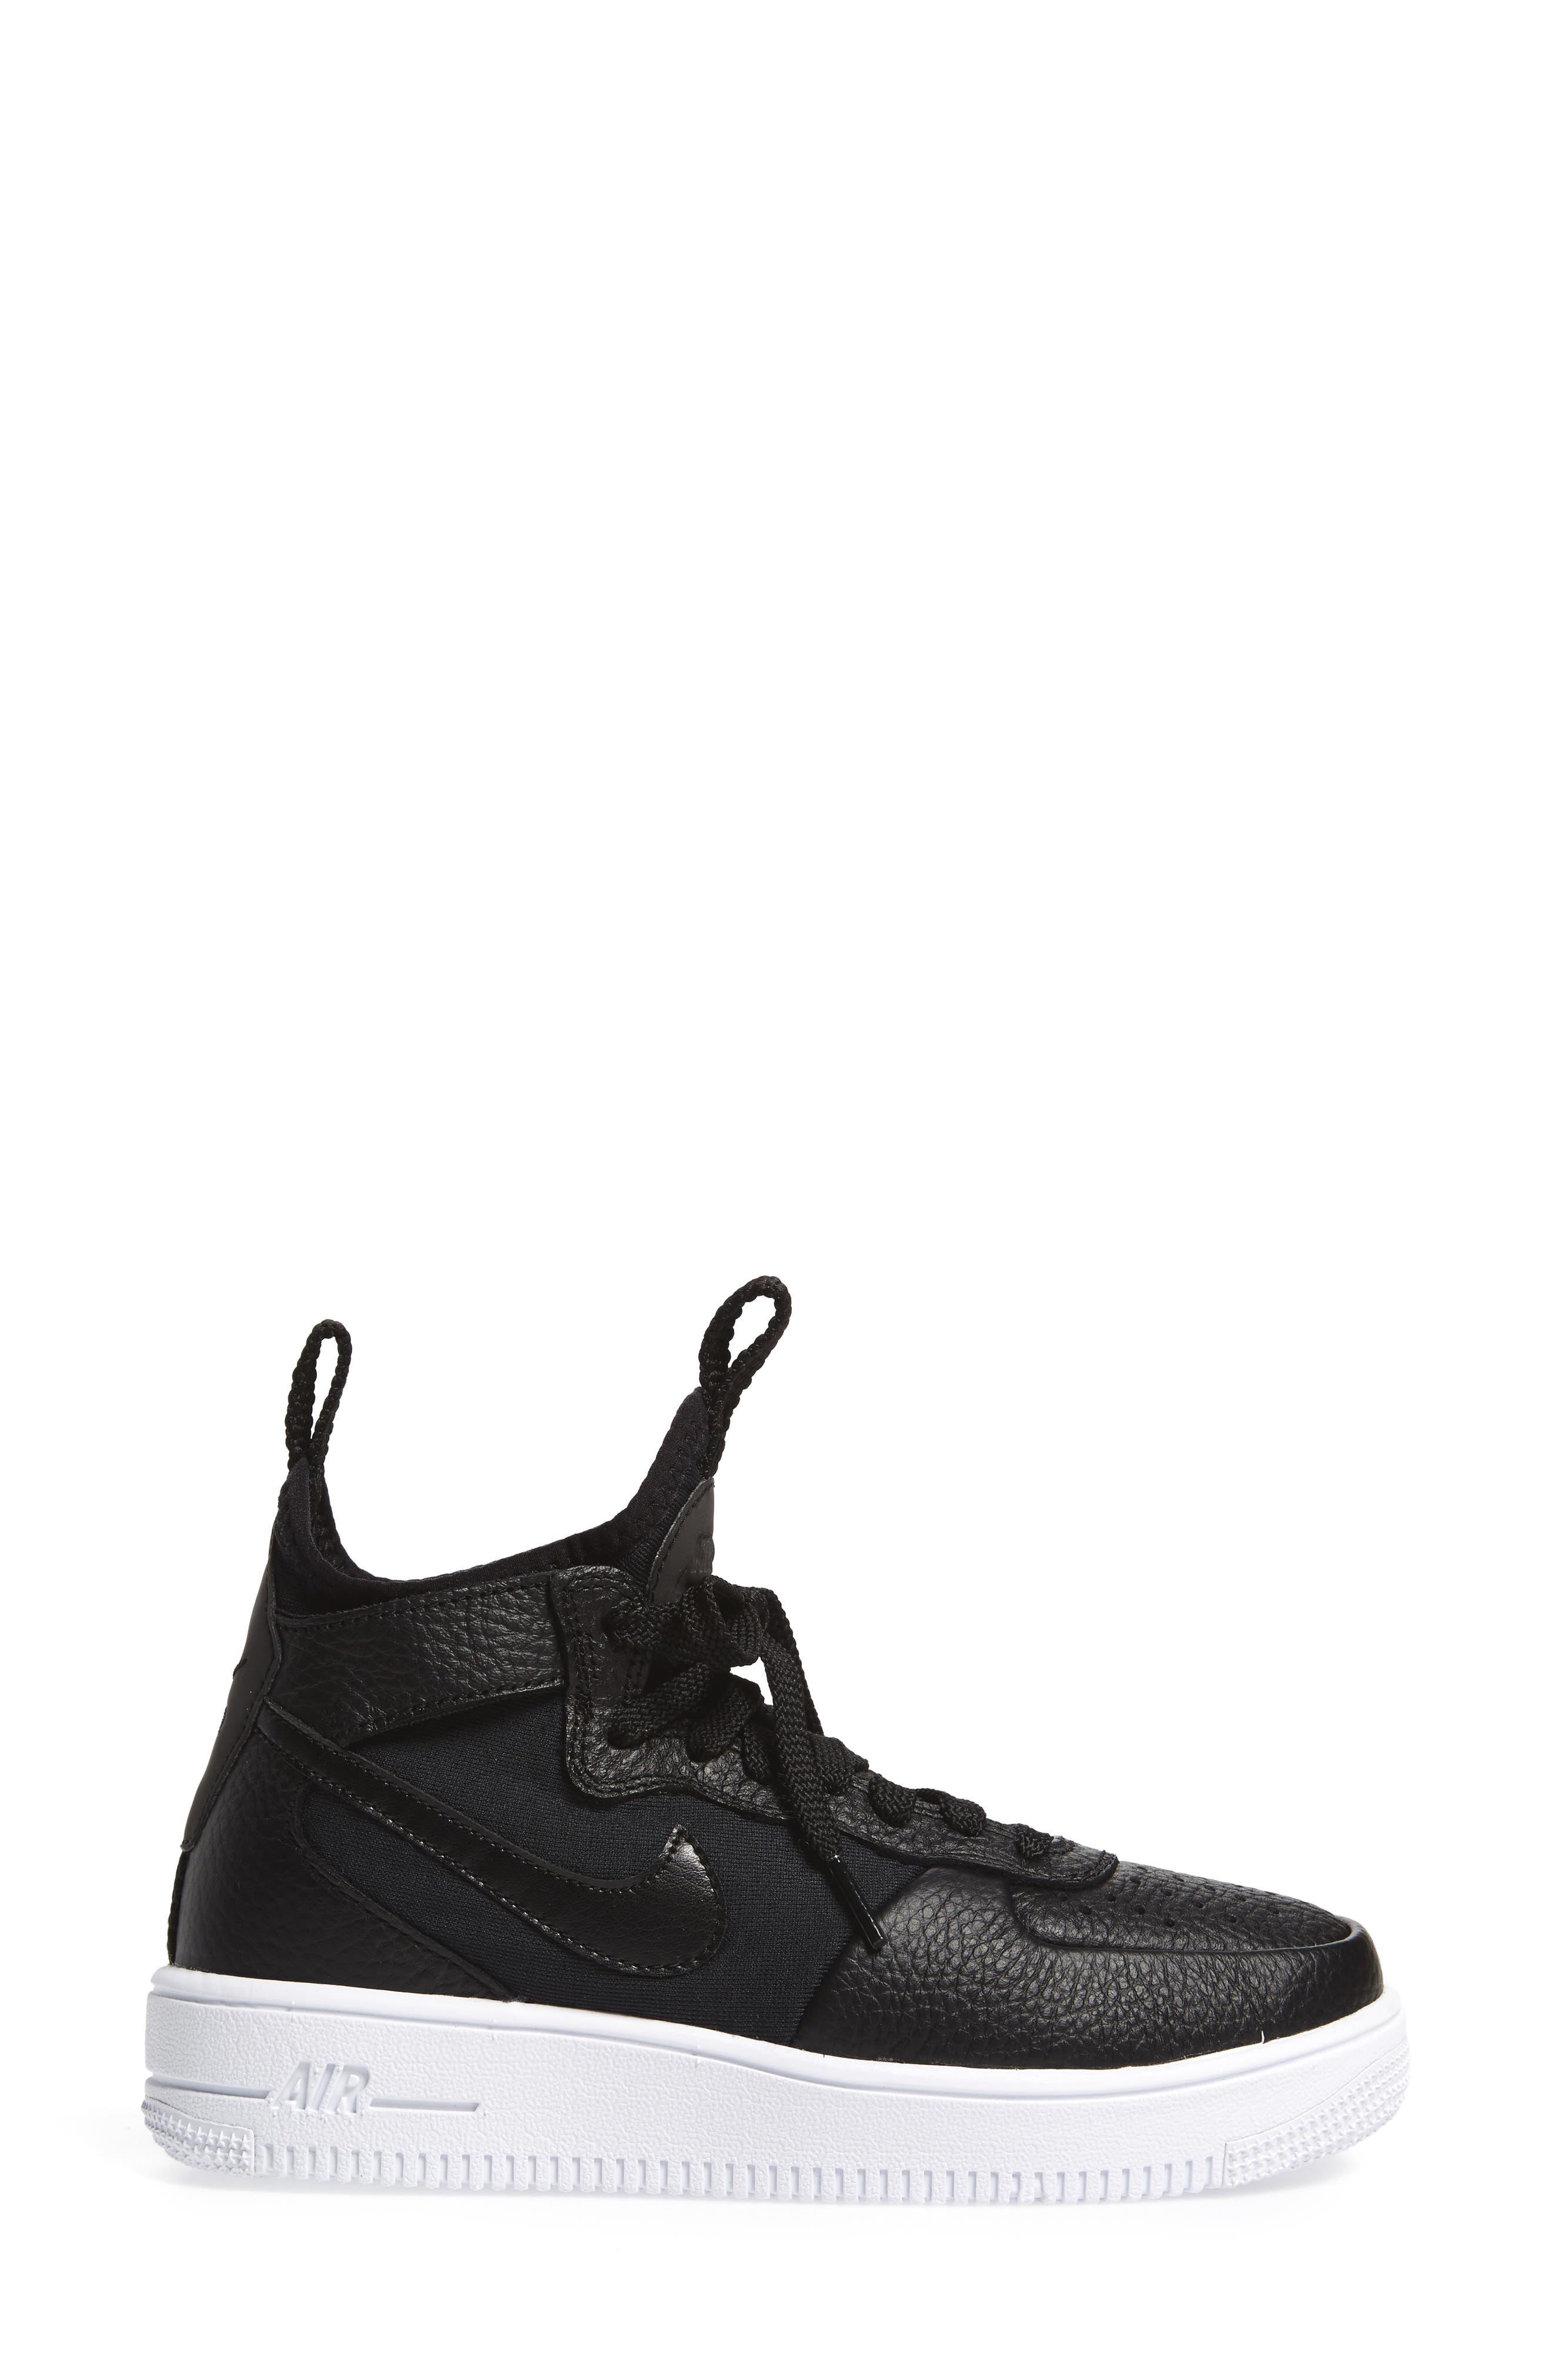 Air Force 1 Ultraforce Mid Sneaker,                             Alternate thumbnail 3, color,                             Black/ Black